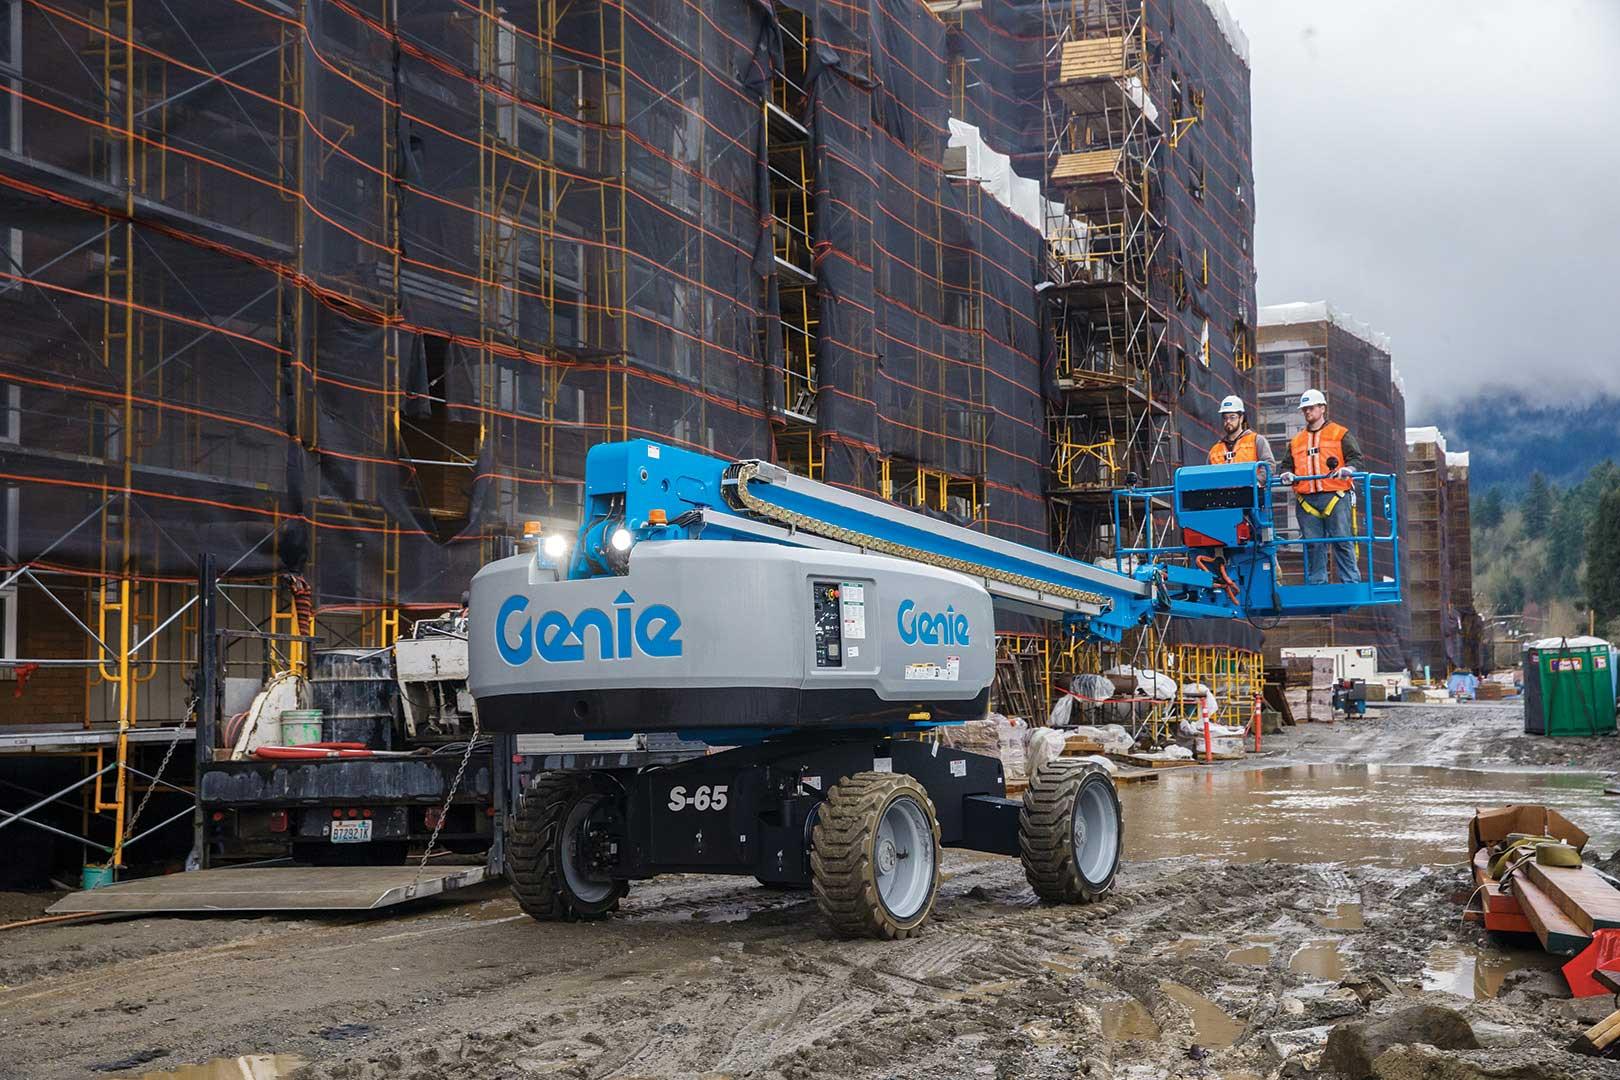 Genie S-60X and S-65